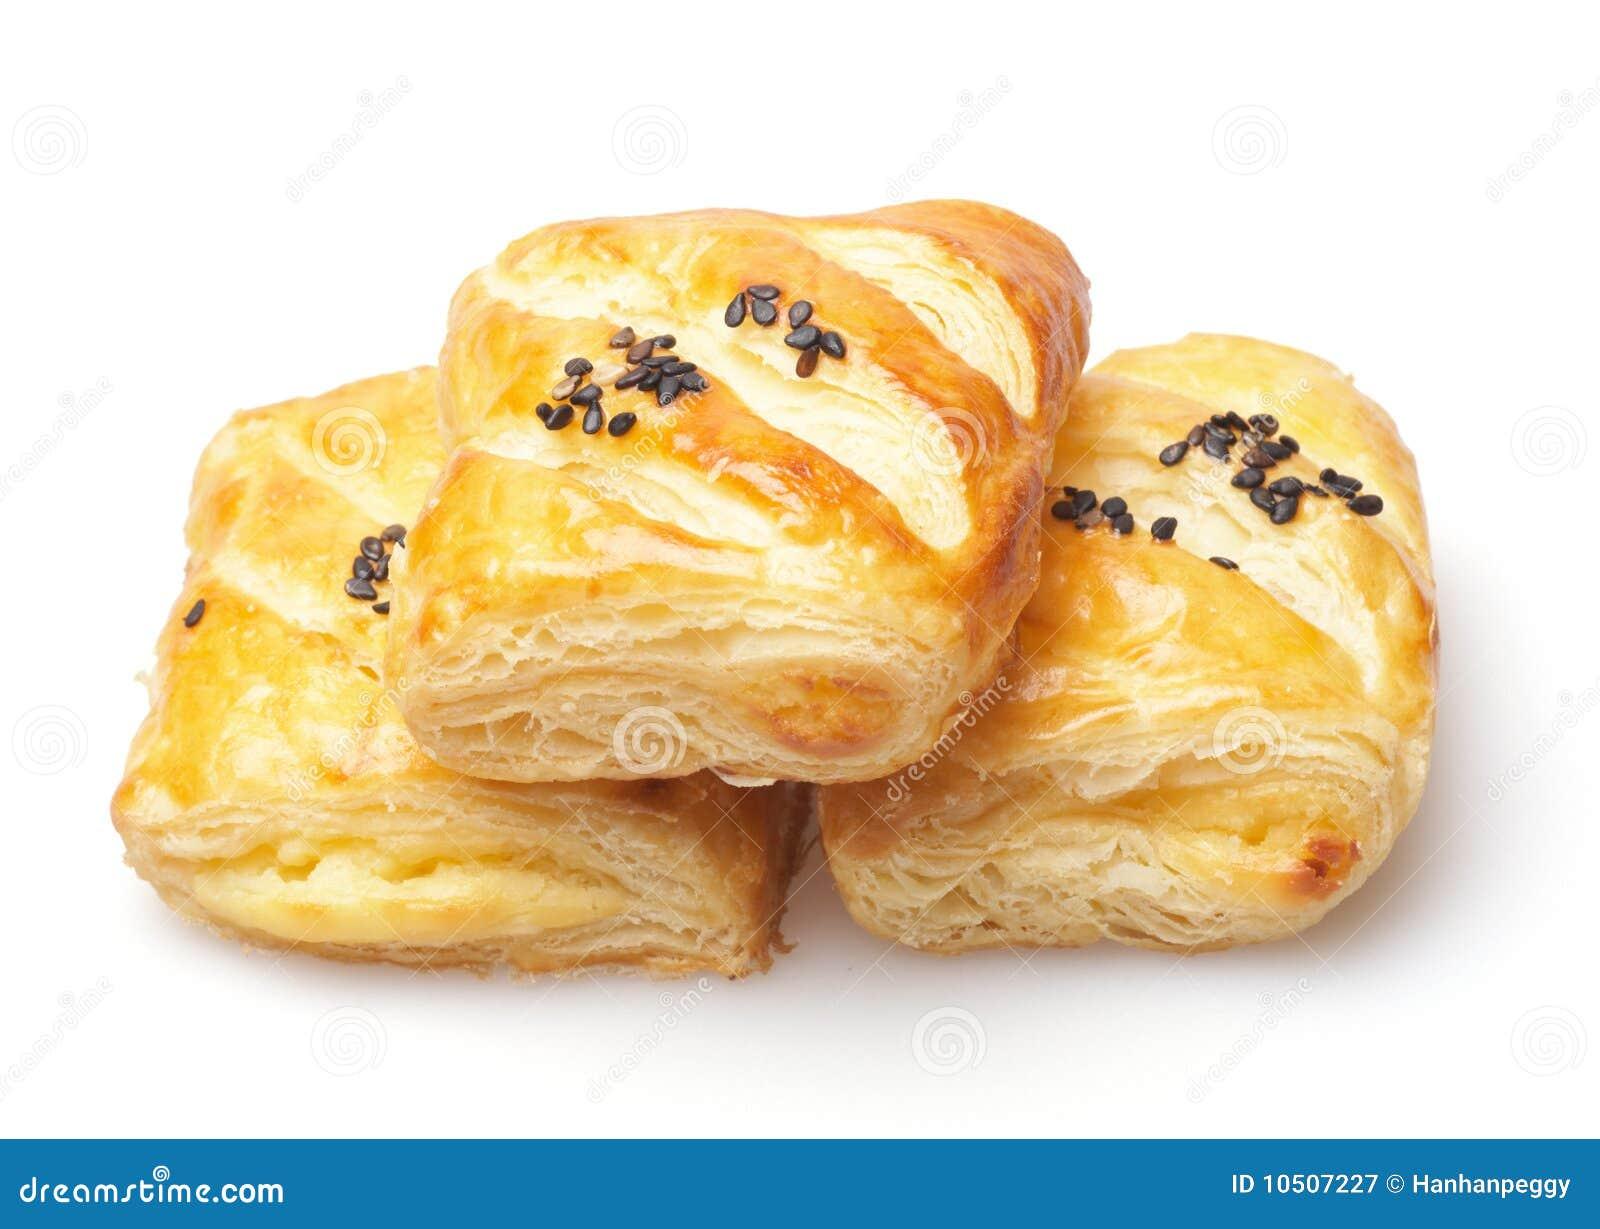 Frans gebakje